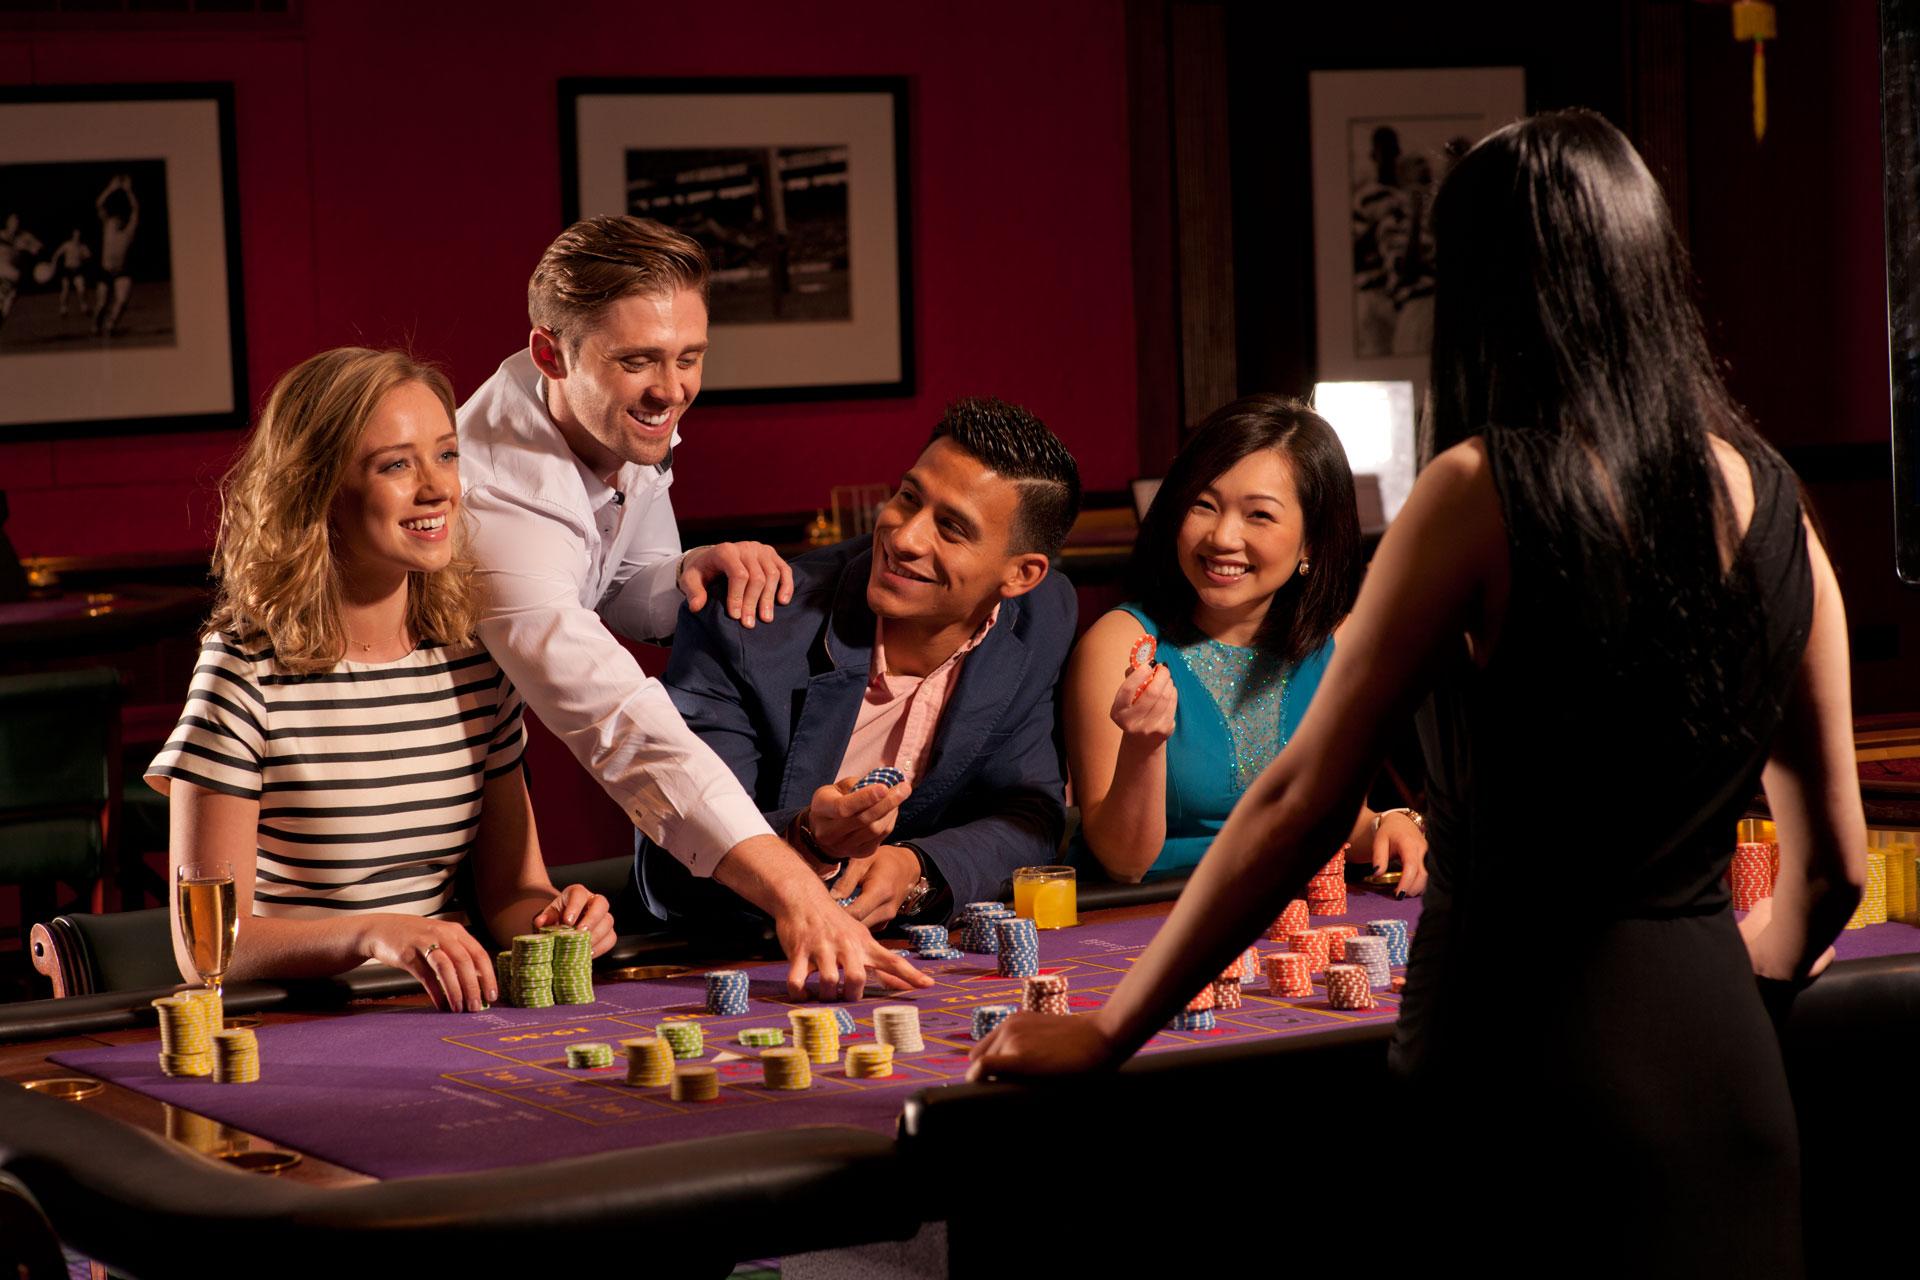 Best Online Casino for Unique Casino Experience